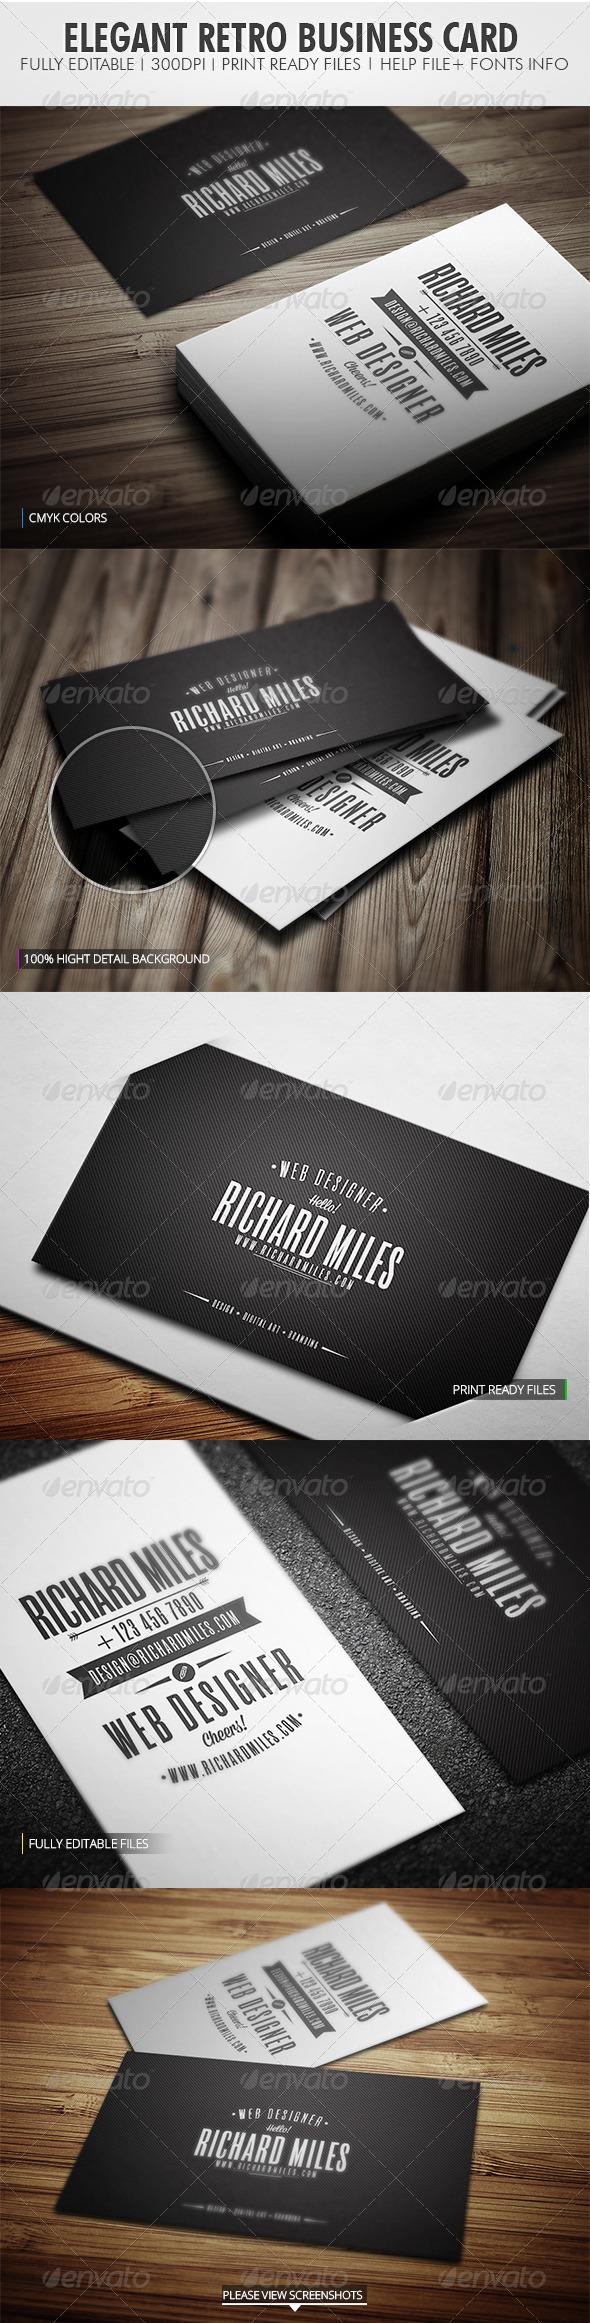 Elegant Retro Business Card - Retro/Vintage Business Cards